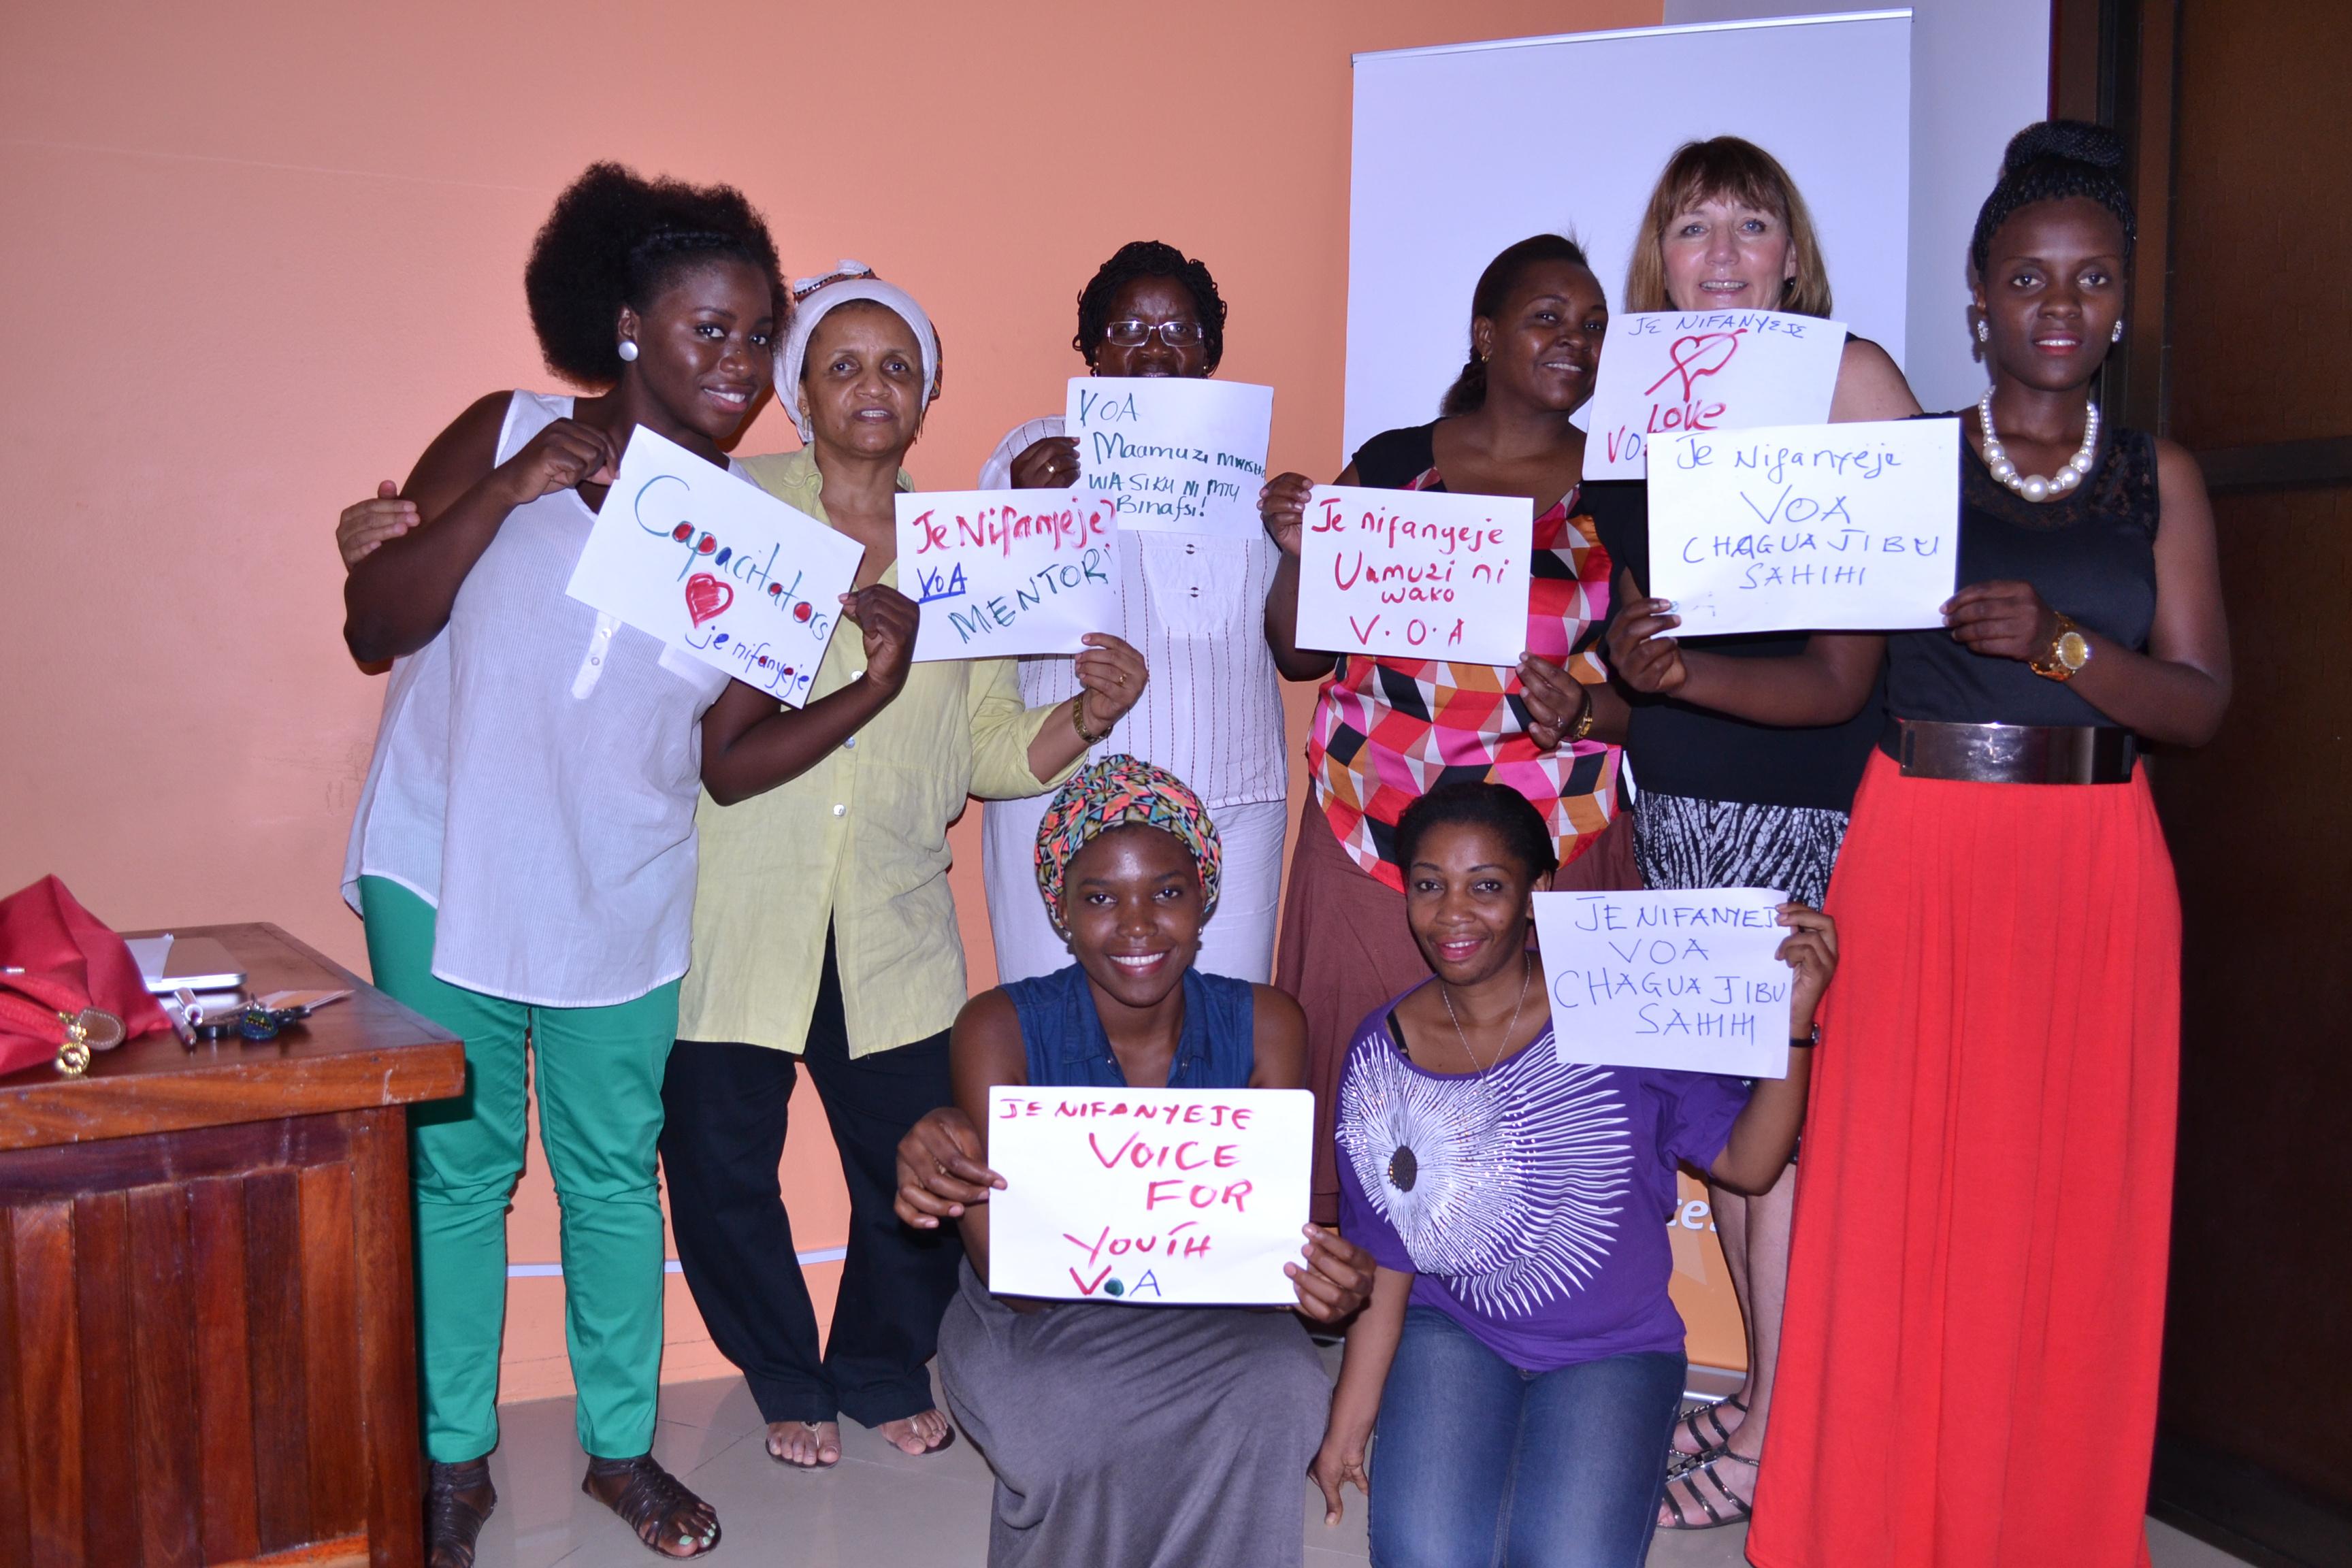 8 women hold handmade signs